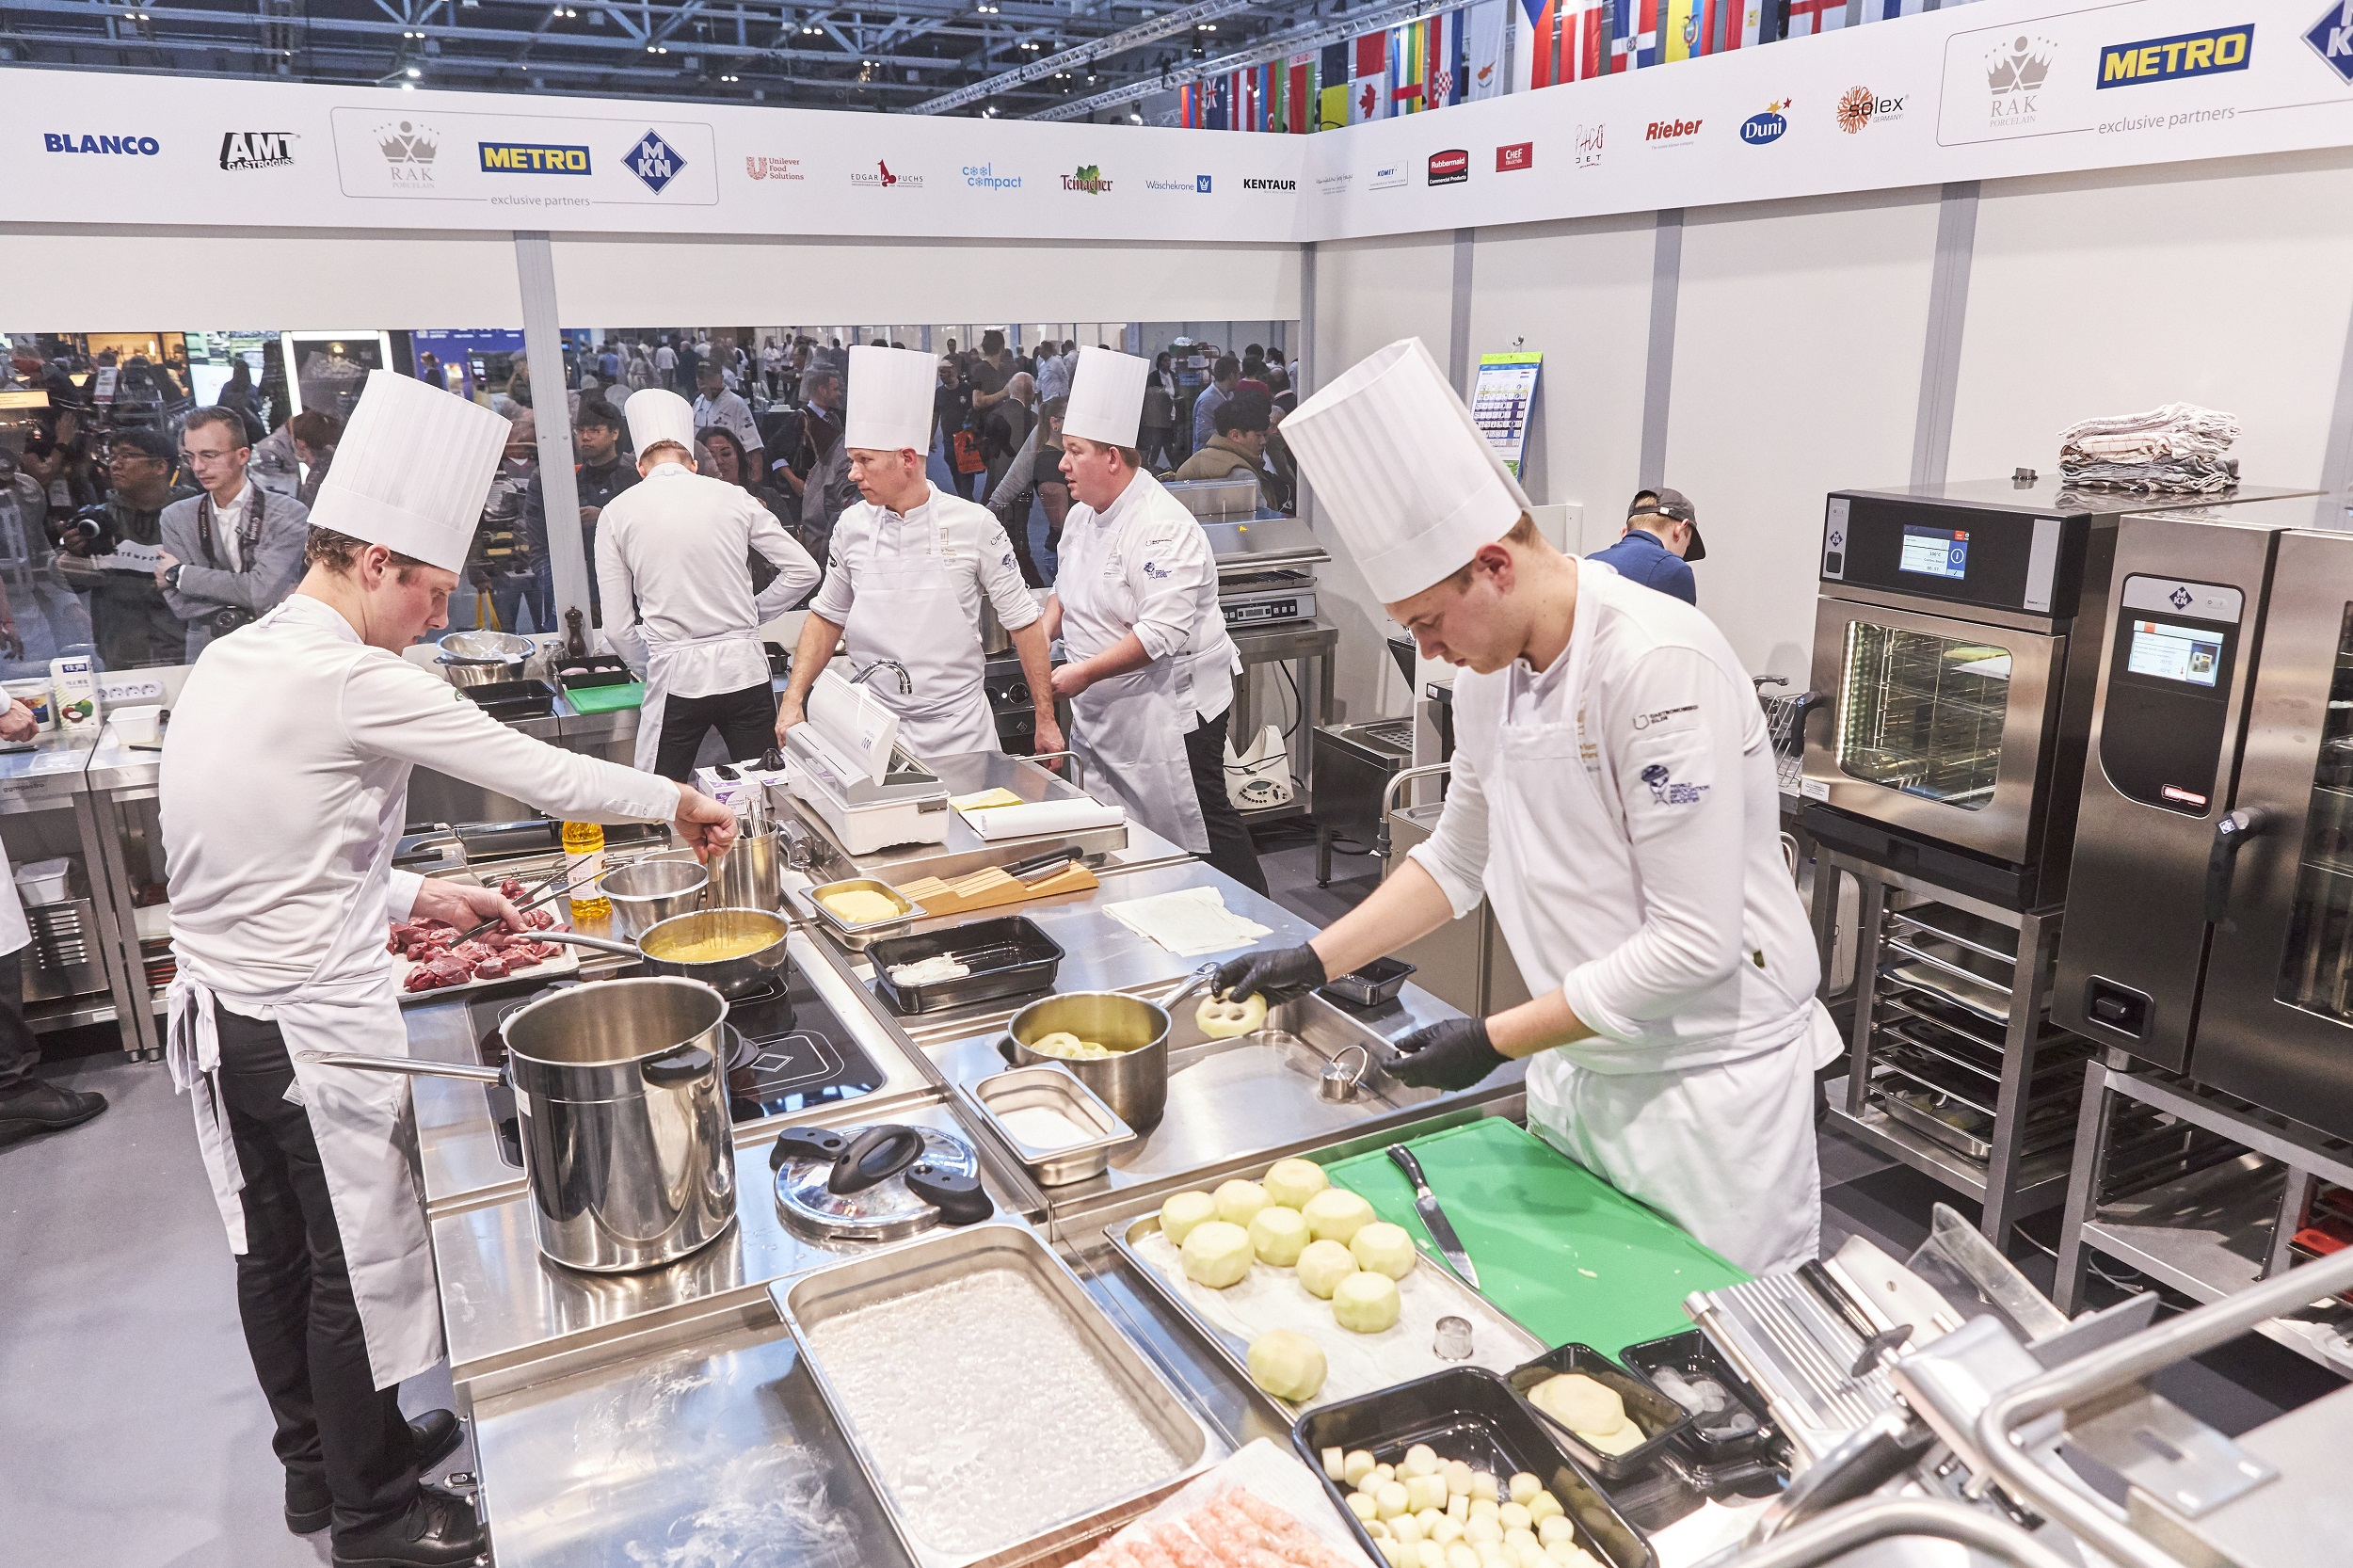 Blick in die Wettbewerbsküchen. Foto: IKA/Culinary Olympics